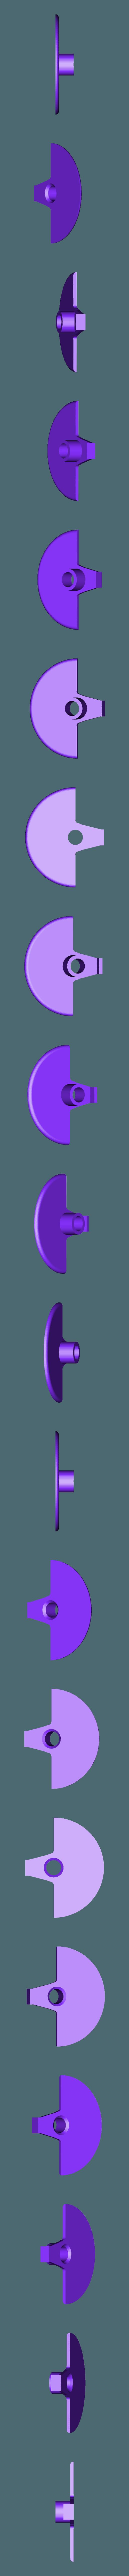 wmy-wheel-pot-06.stl Download free STL file MX MIDI Guitar • 3D print model, Adafruit